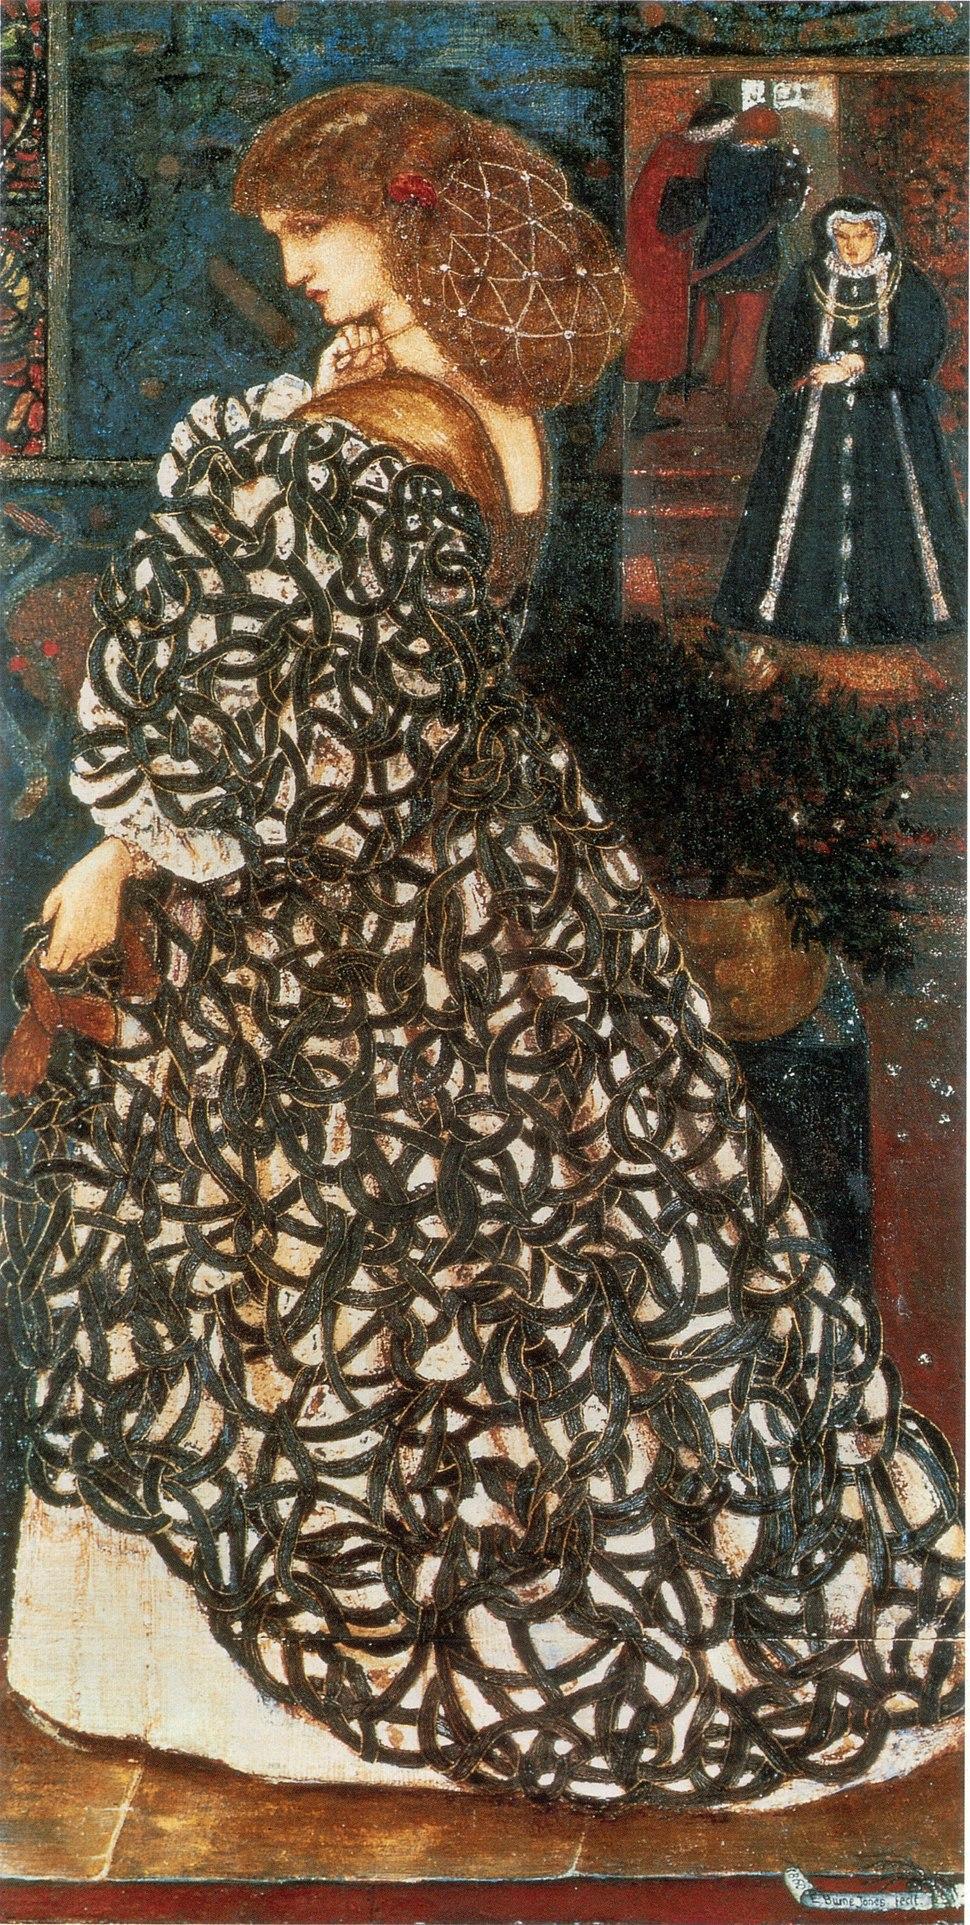 Edward Burne-Jones Sidonia von Bork